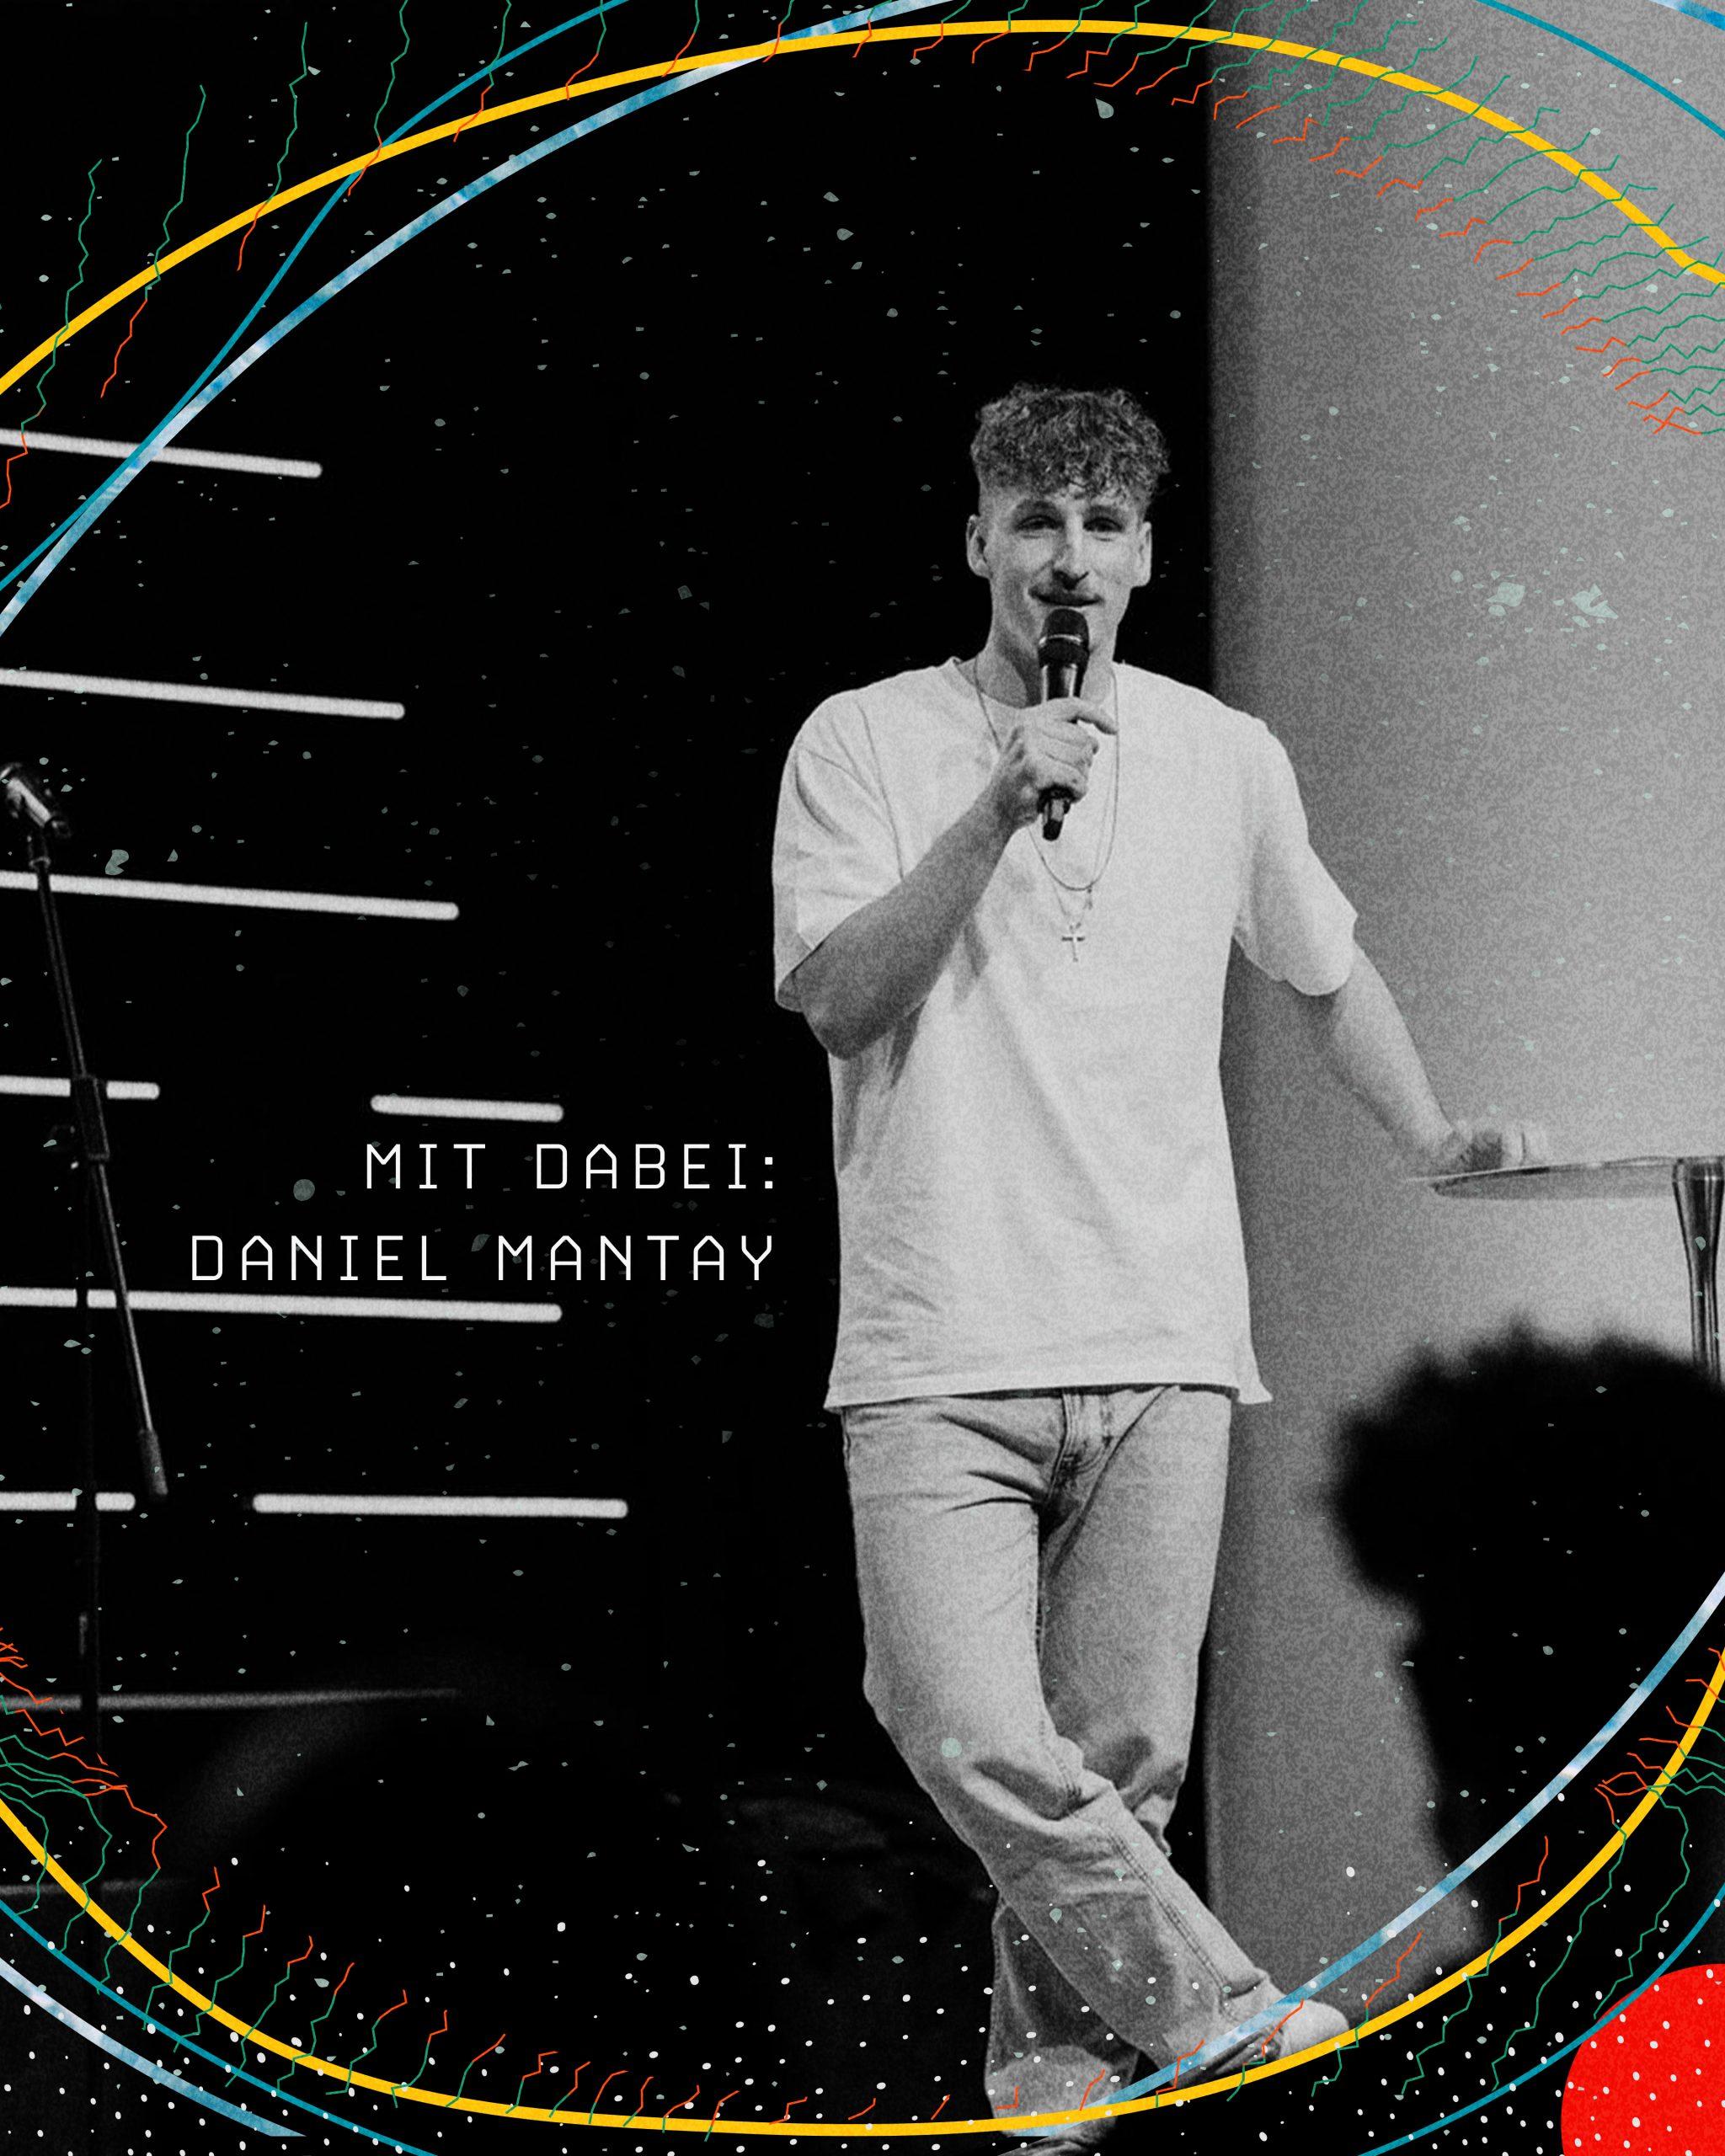 Daniel Mantay